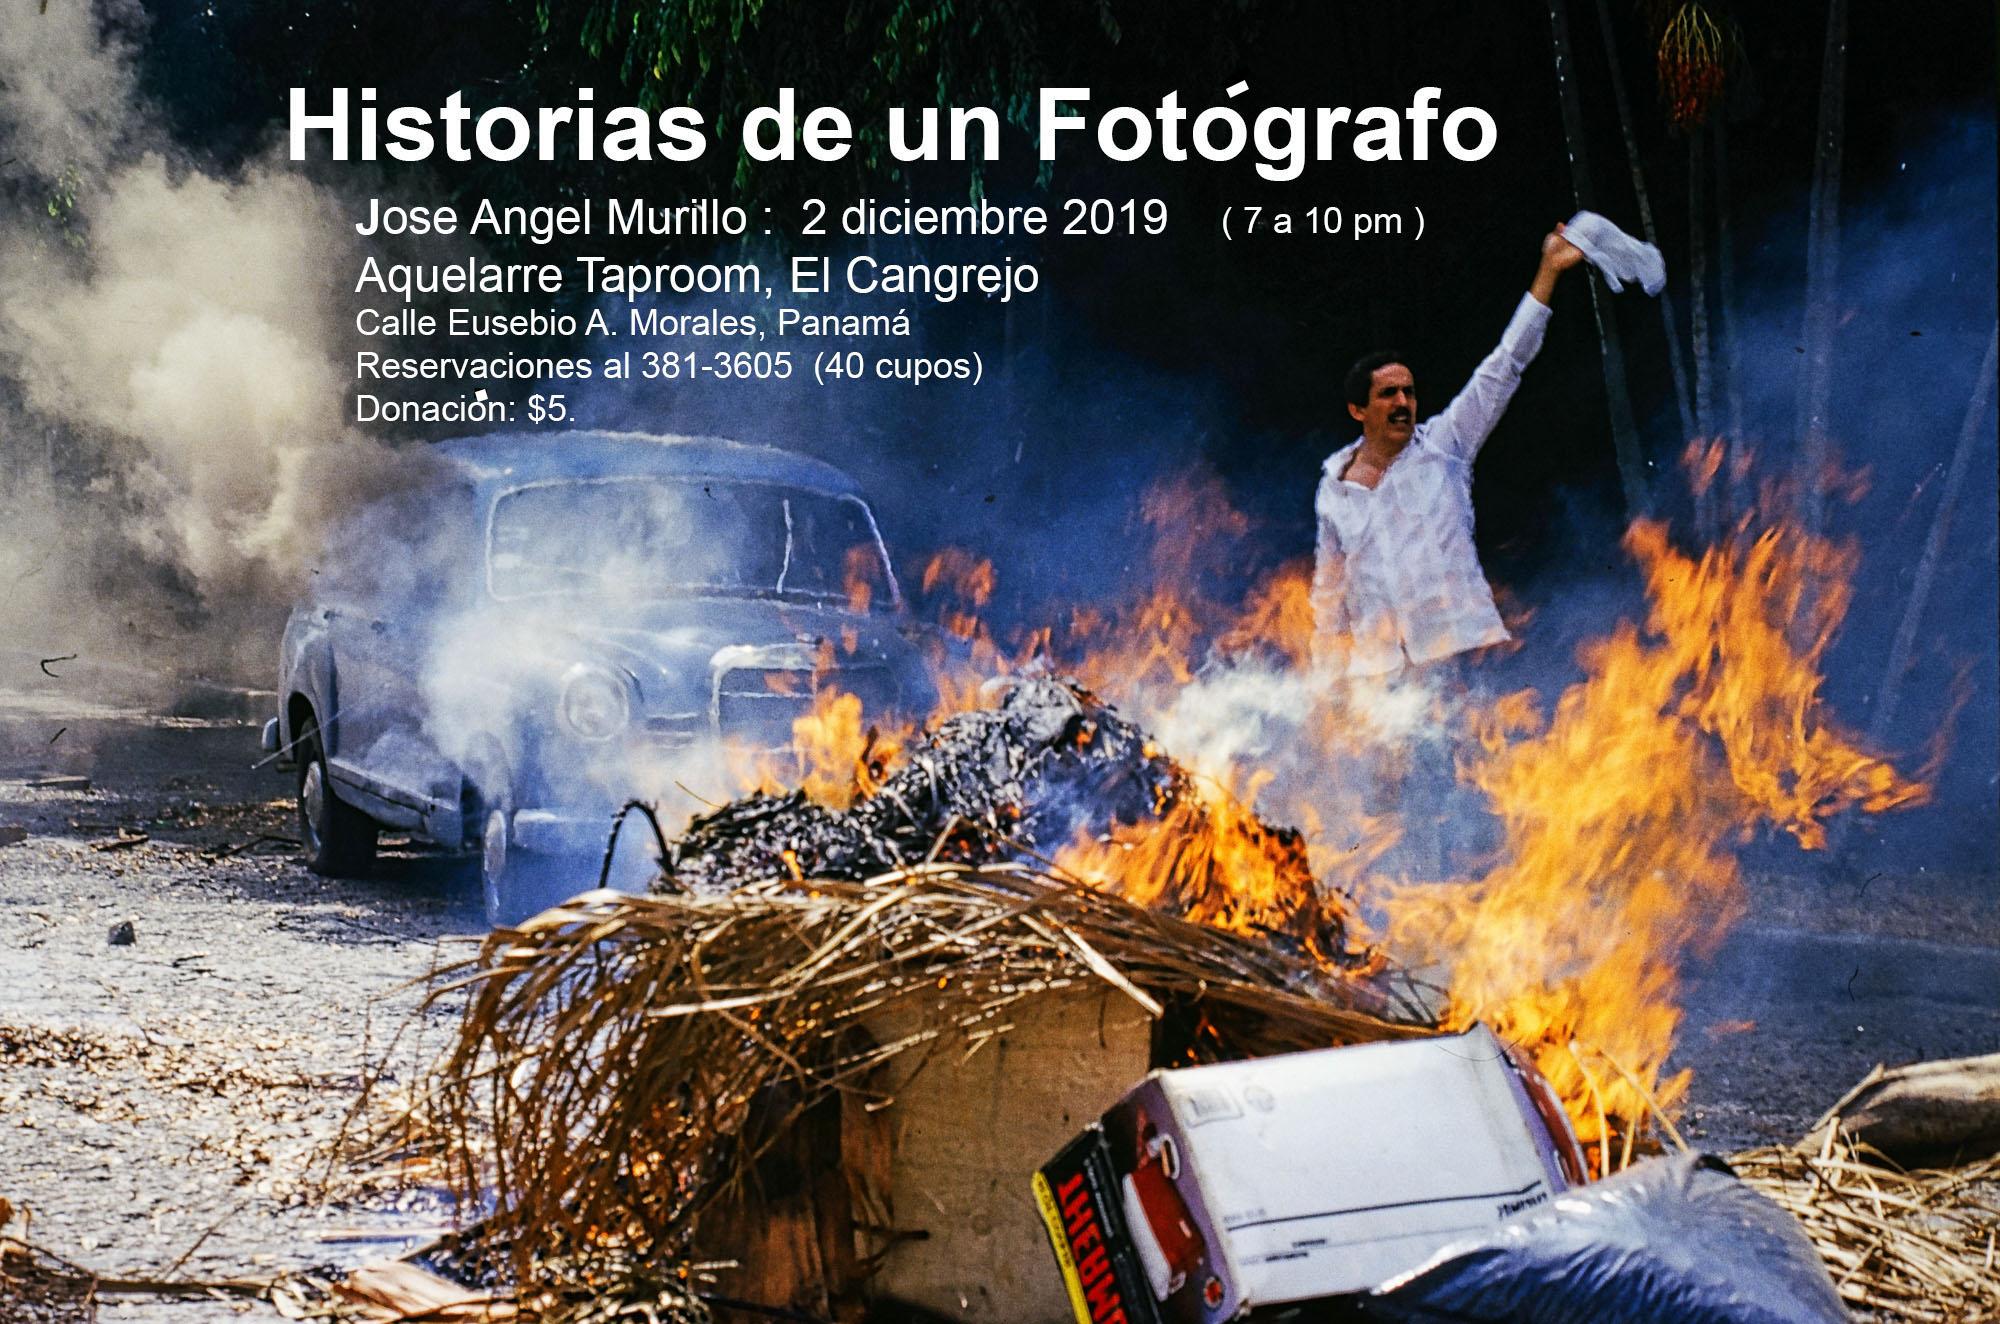 Historias de un Fotografo